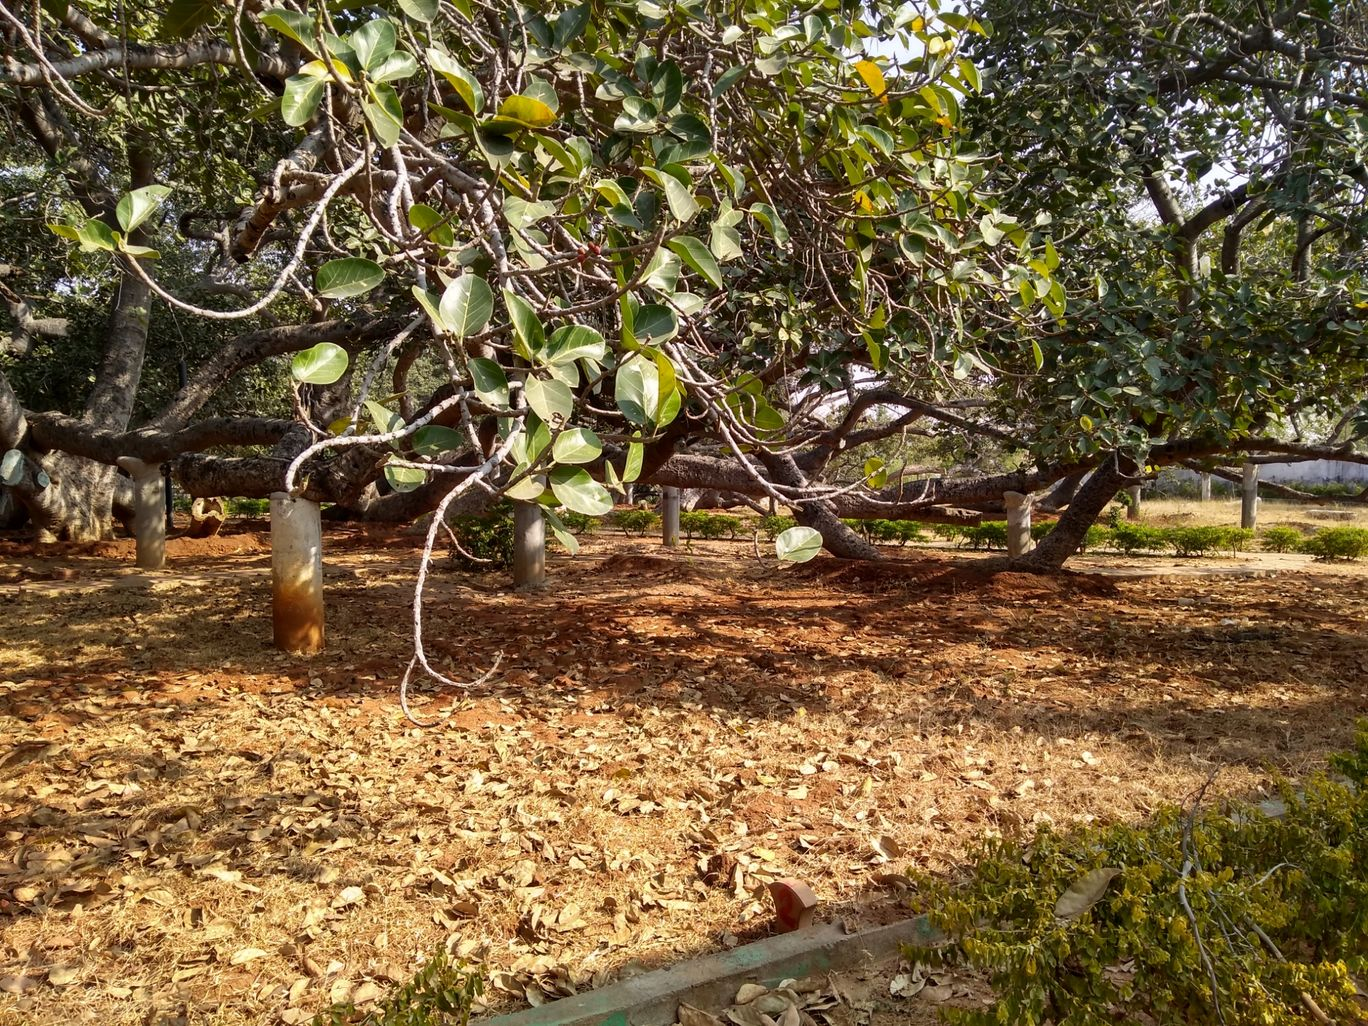 Photo of Pillala Marri Giant Banyan Tree By Sandeep Kumar Chanda